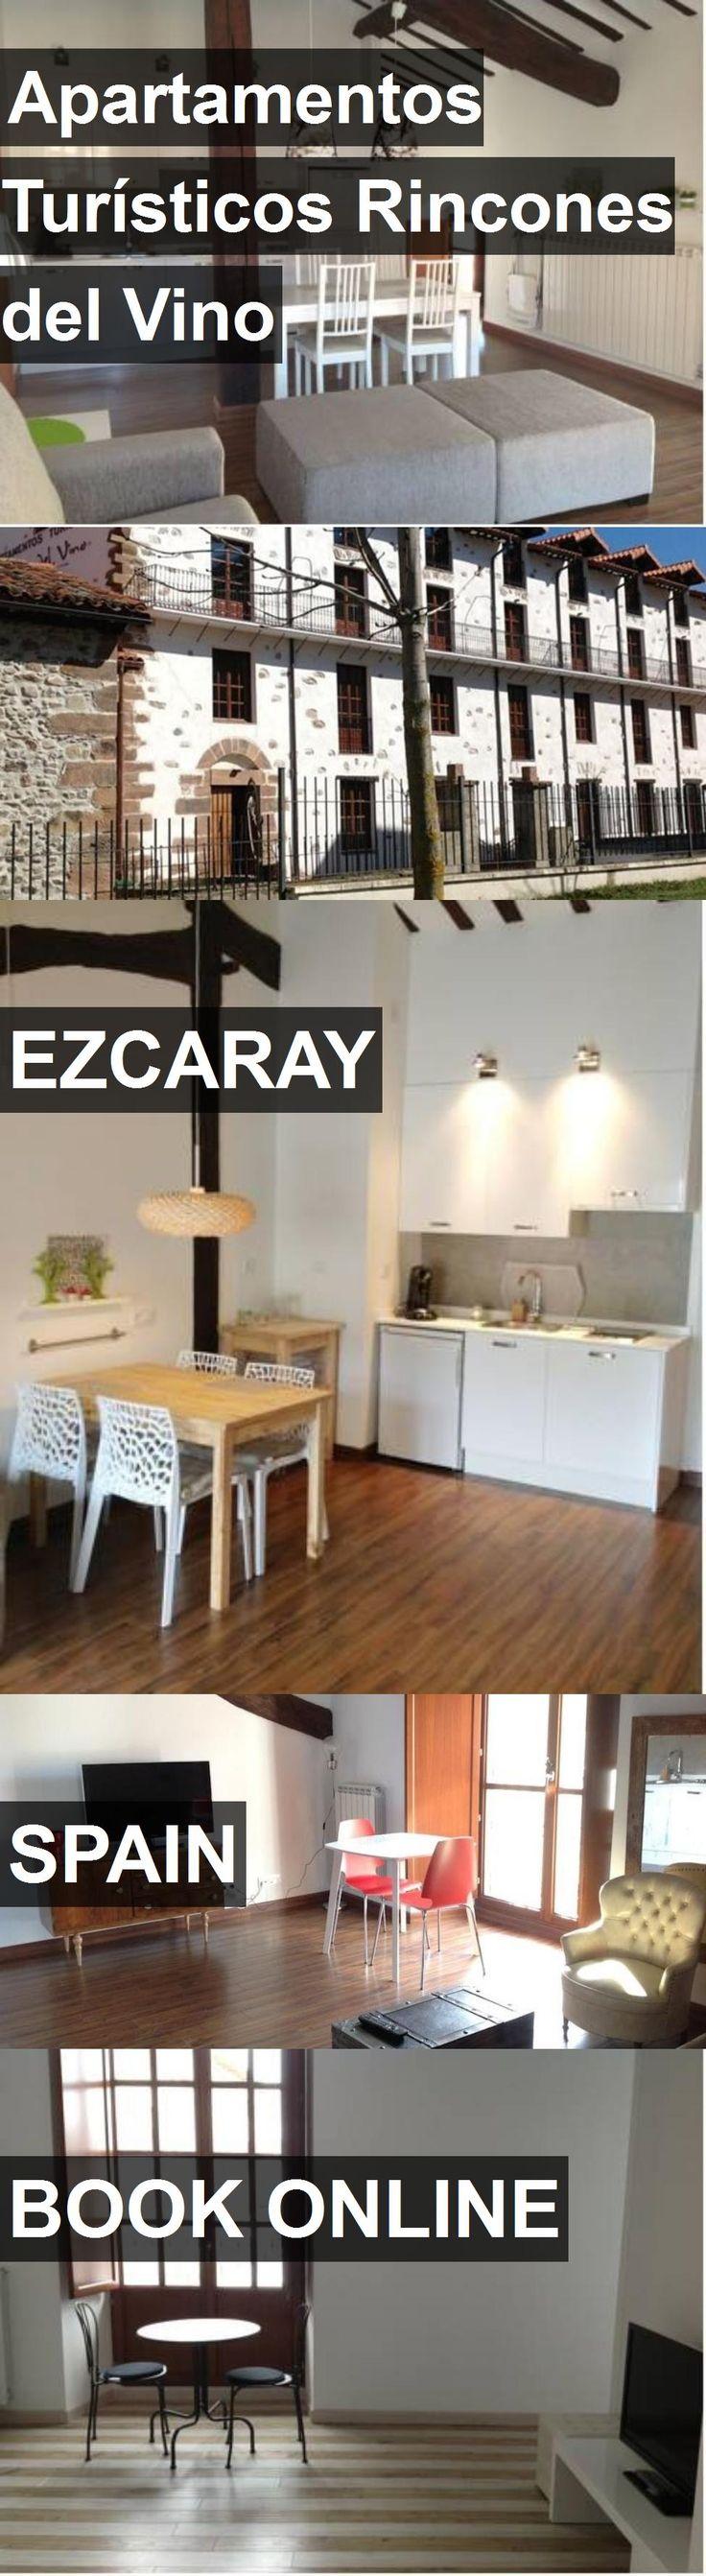 Hotel Apartamentos Turísticos Rincones del Vino in Ezcaray, Spain. For more information, photos, reviews and best prices please follow the link. #Spain #Ezcaray #ApartamentosTurísticosRinconesdelVino #hotel #travel #vacation